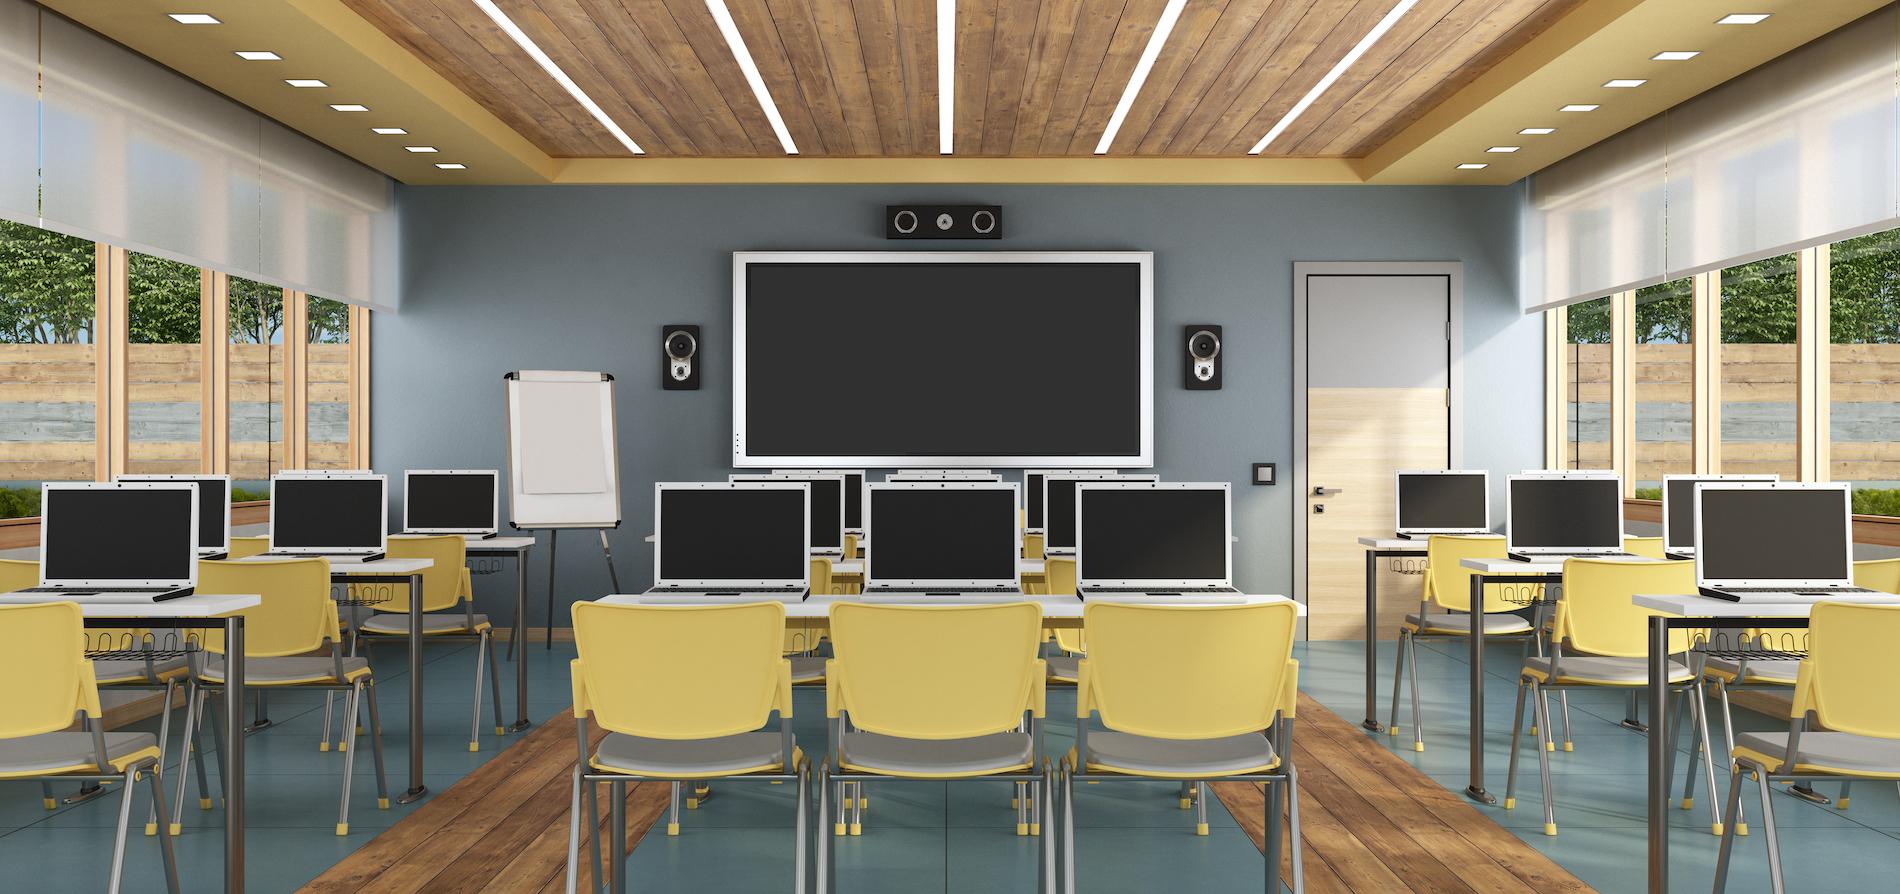 KHDA announces opening of ten new schools in Dubai